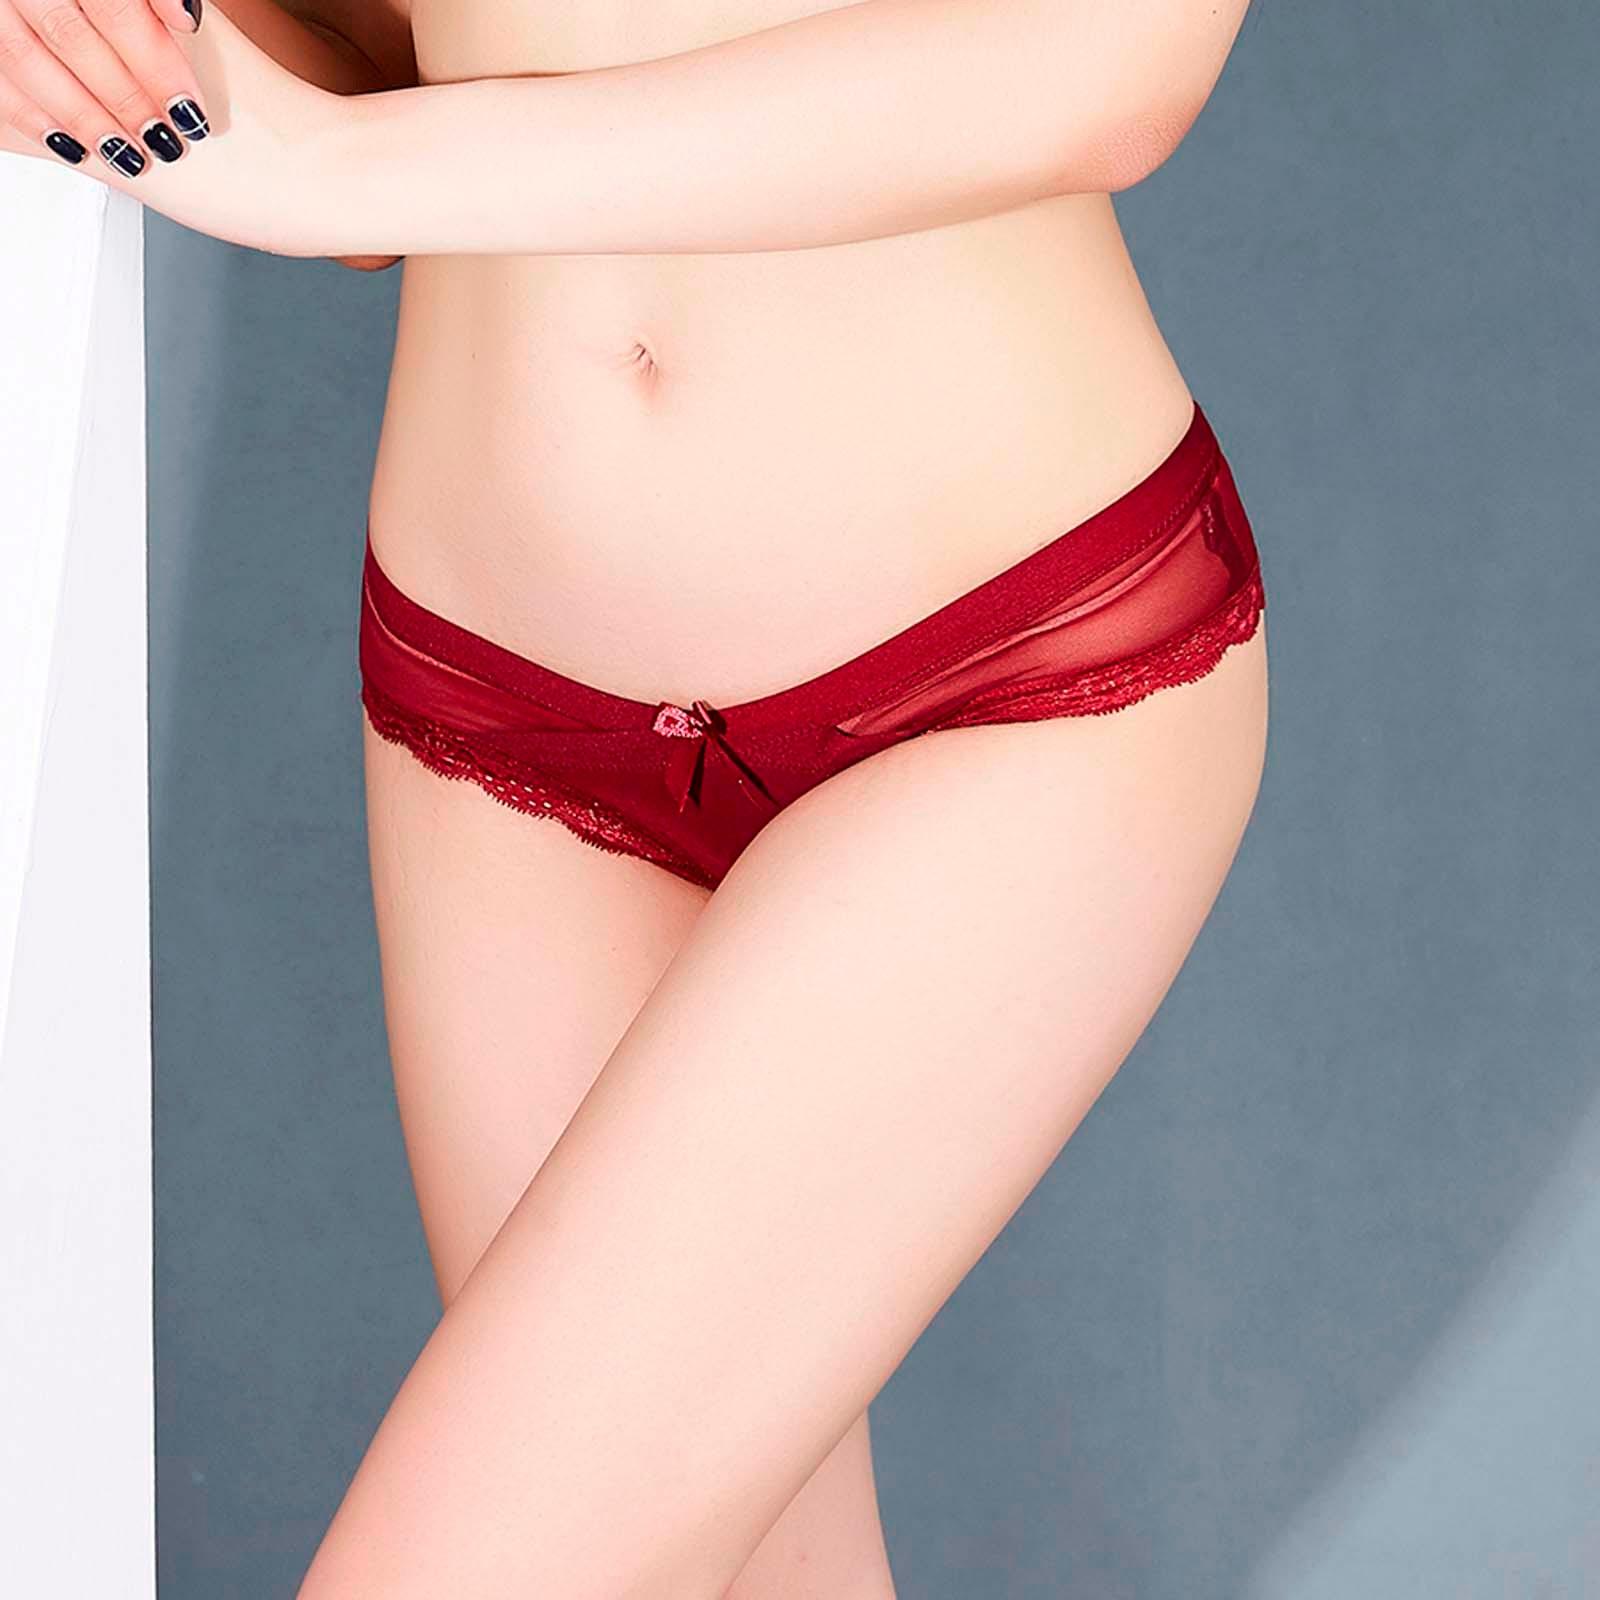 Underwear women Cotton panty sexy panties Briefs Woman Underwear Lace Panties sexy Lingerie for Fema